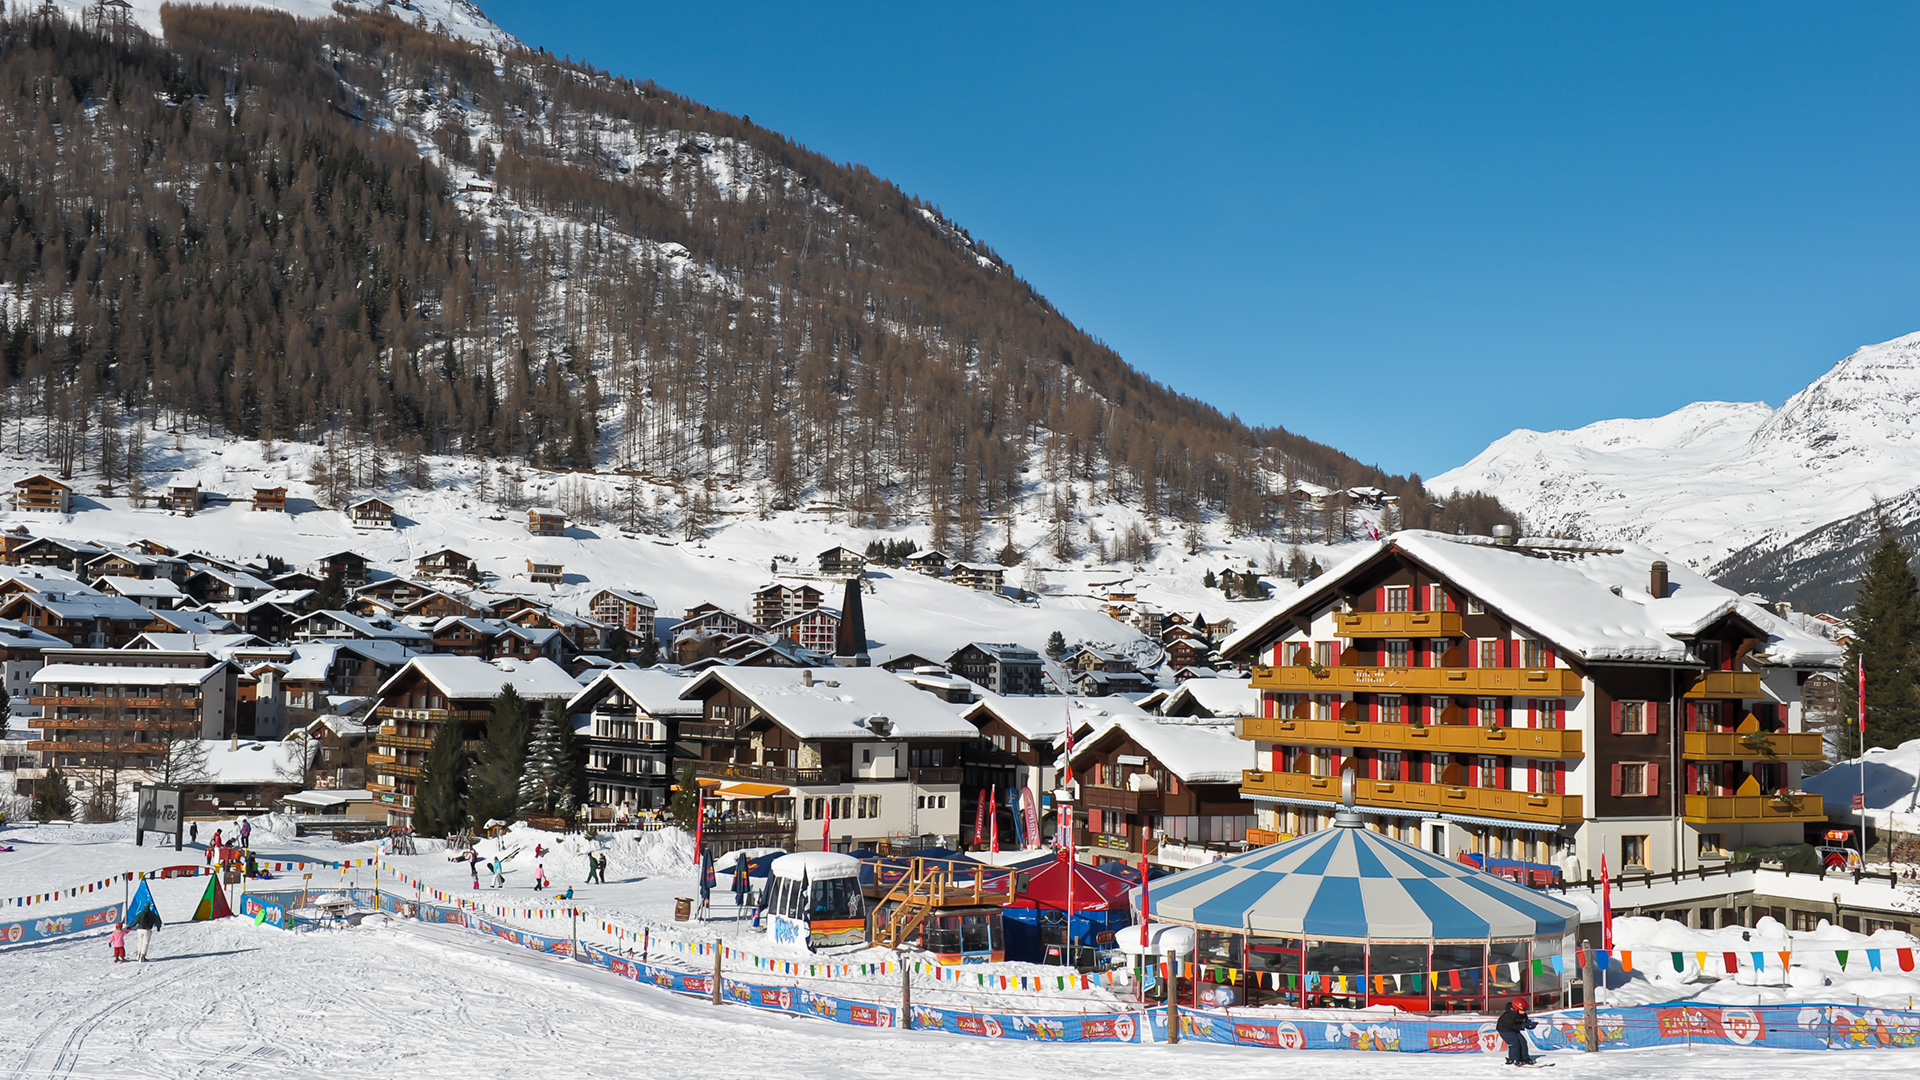 Nordic (Saastal Village) Apartments, Switzerland